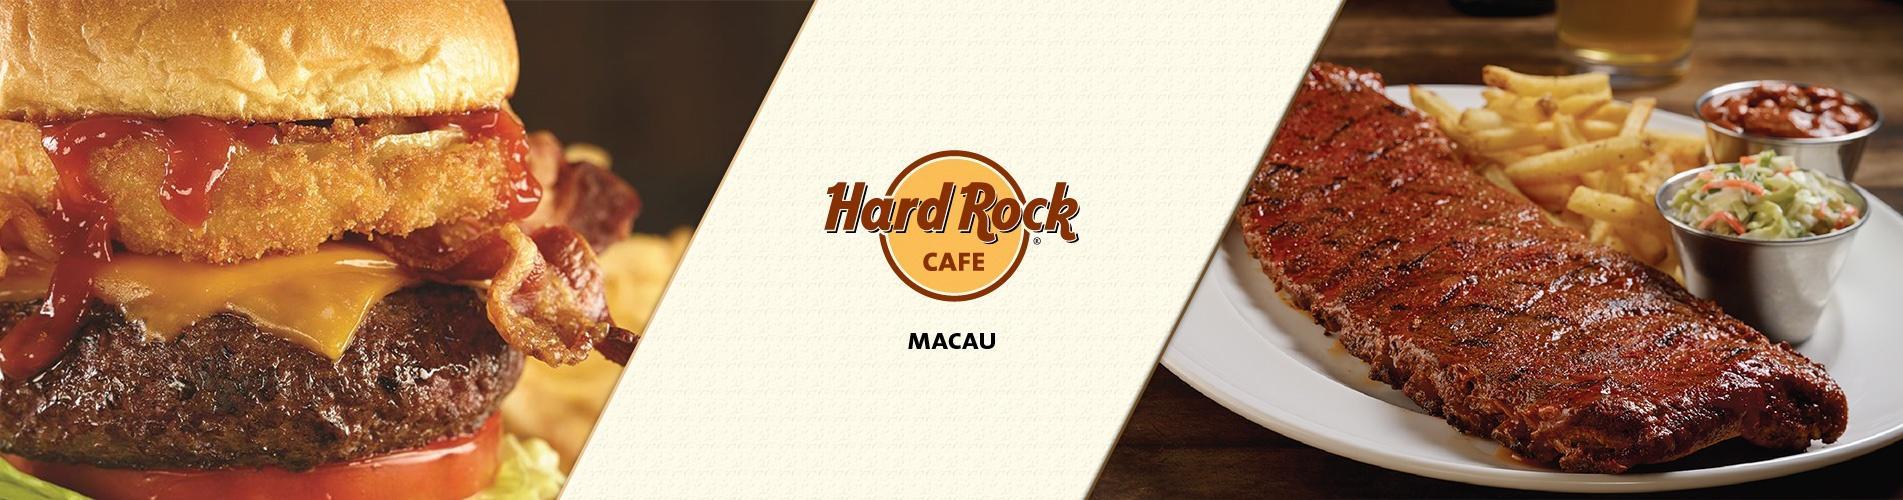 Hard Rock Cafe 午市 / 晚市套餐